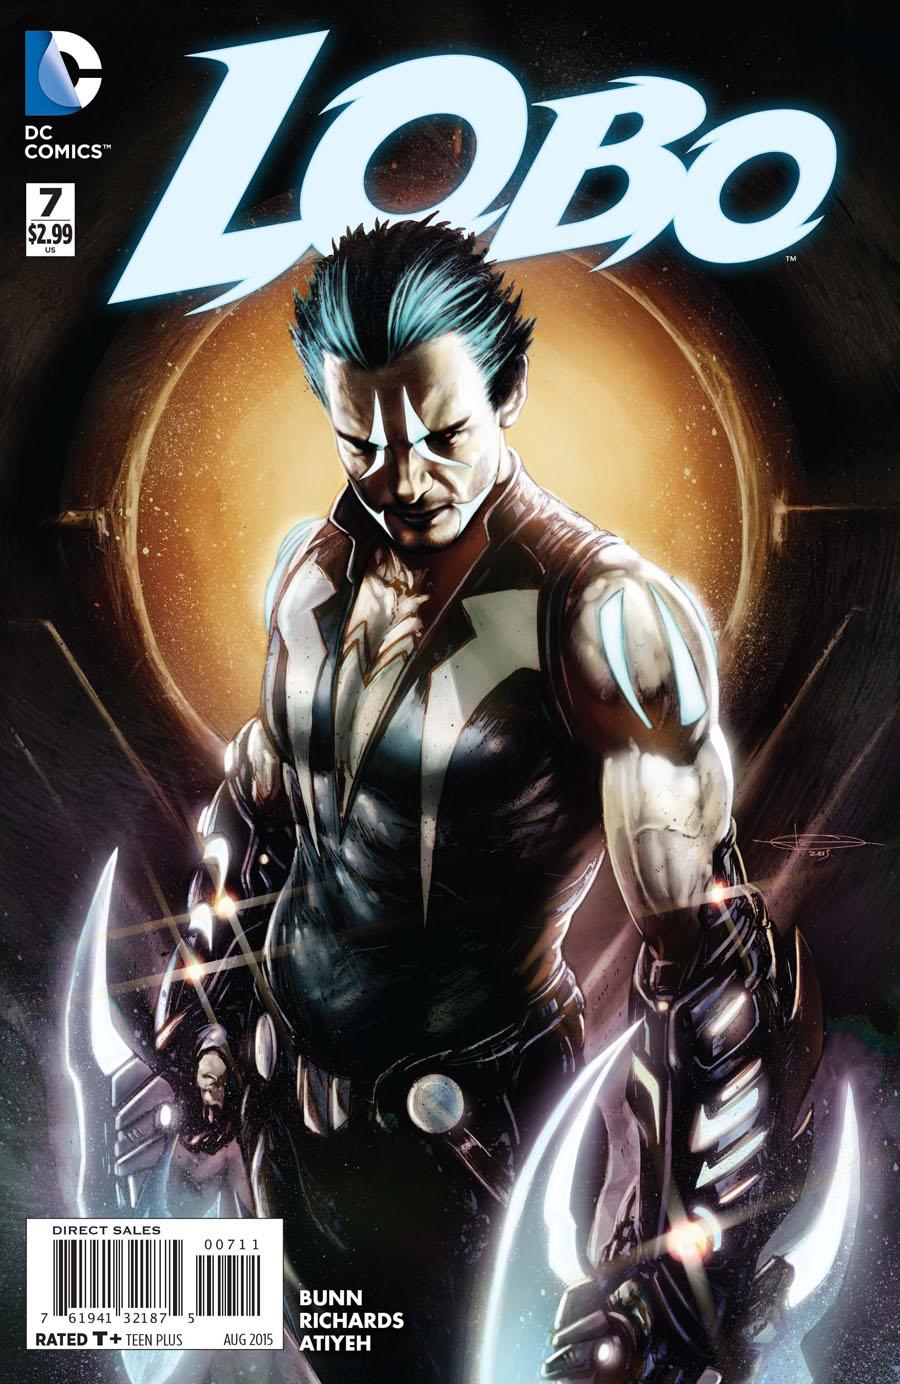 Lobo Vol 3 #7 Cover A Regular Cliff Richards Cover